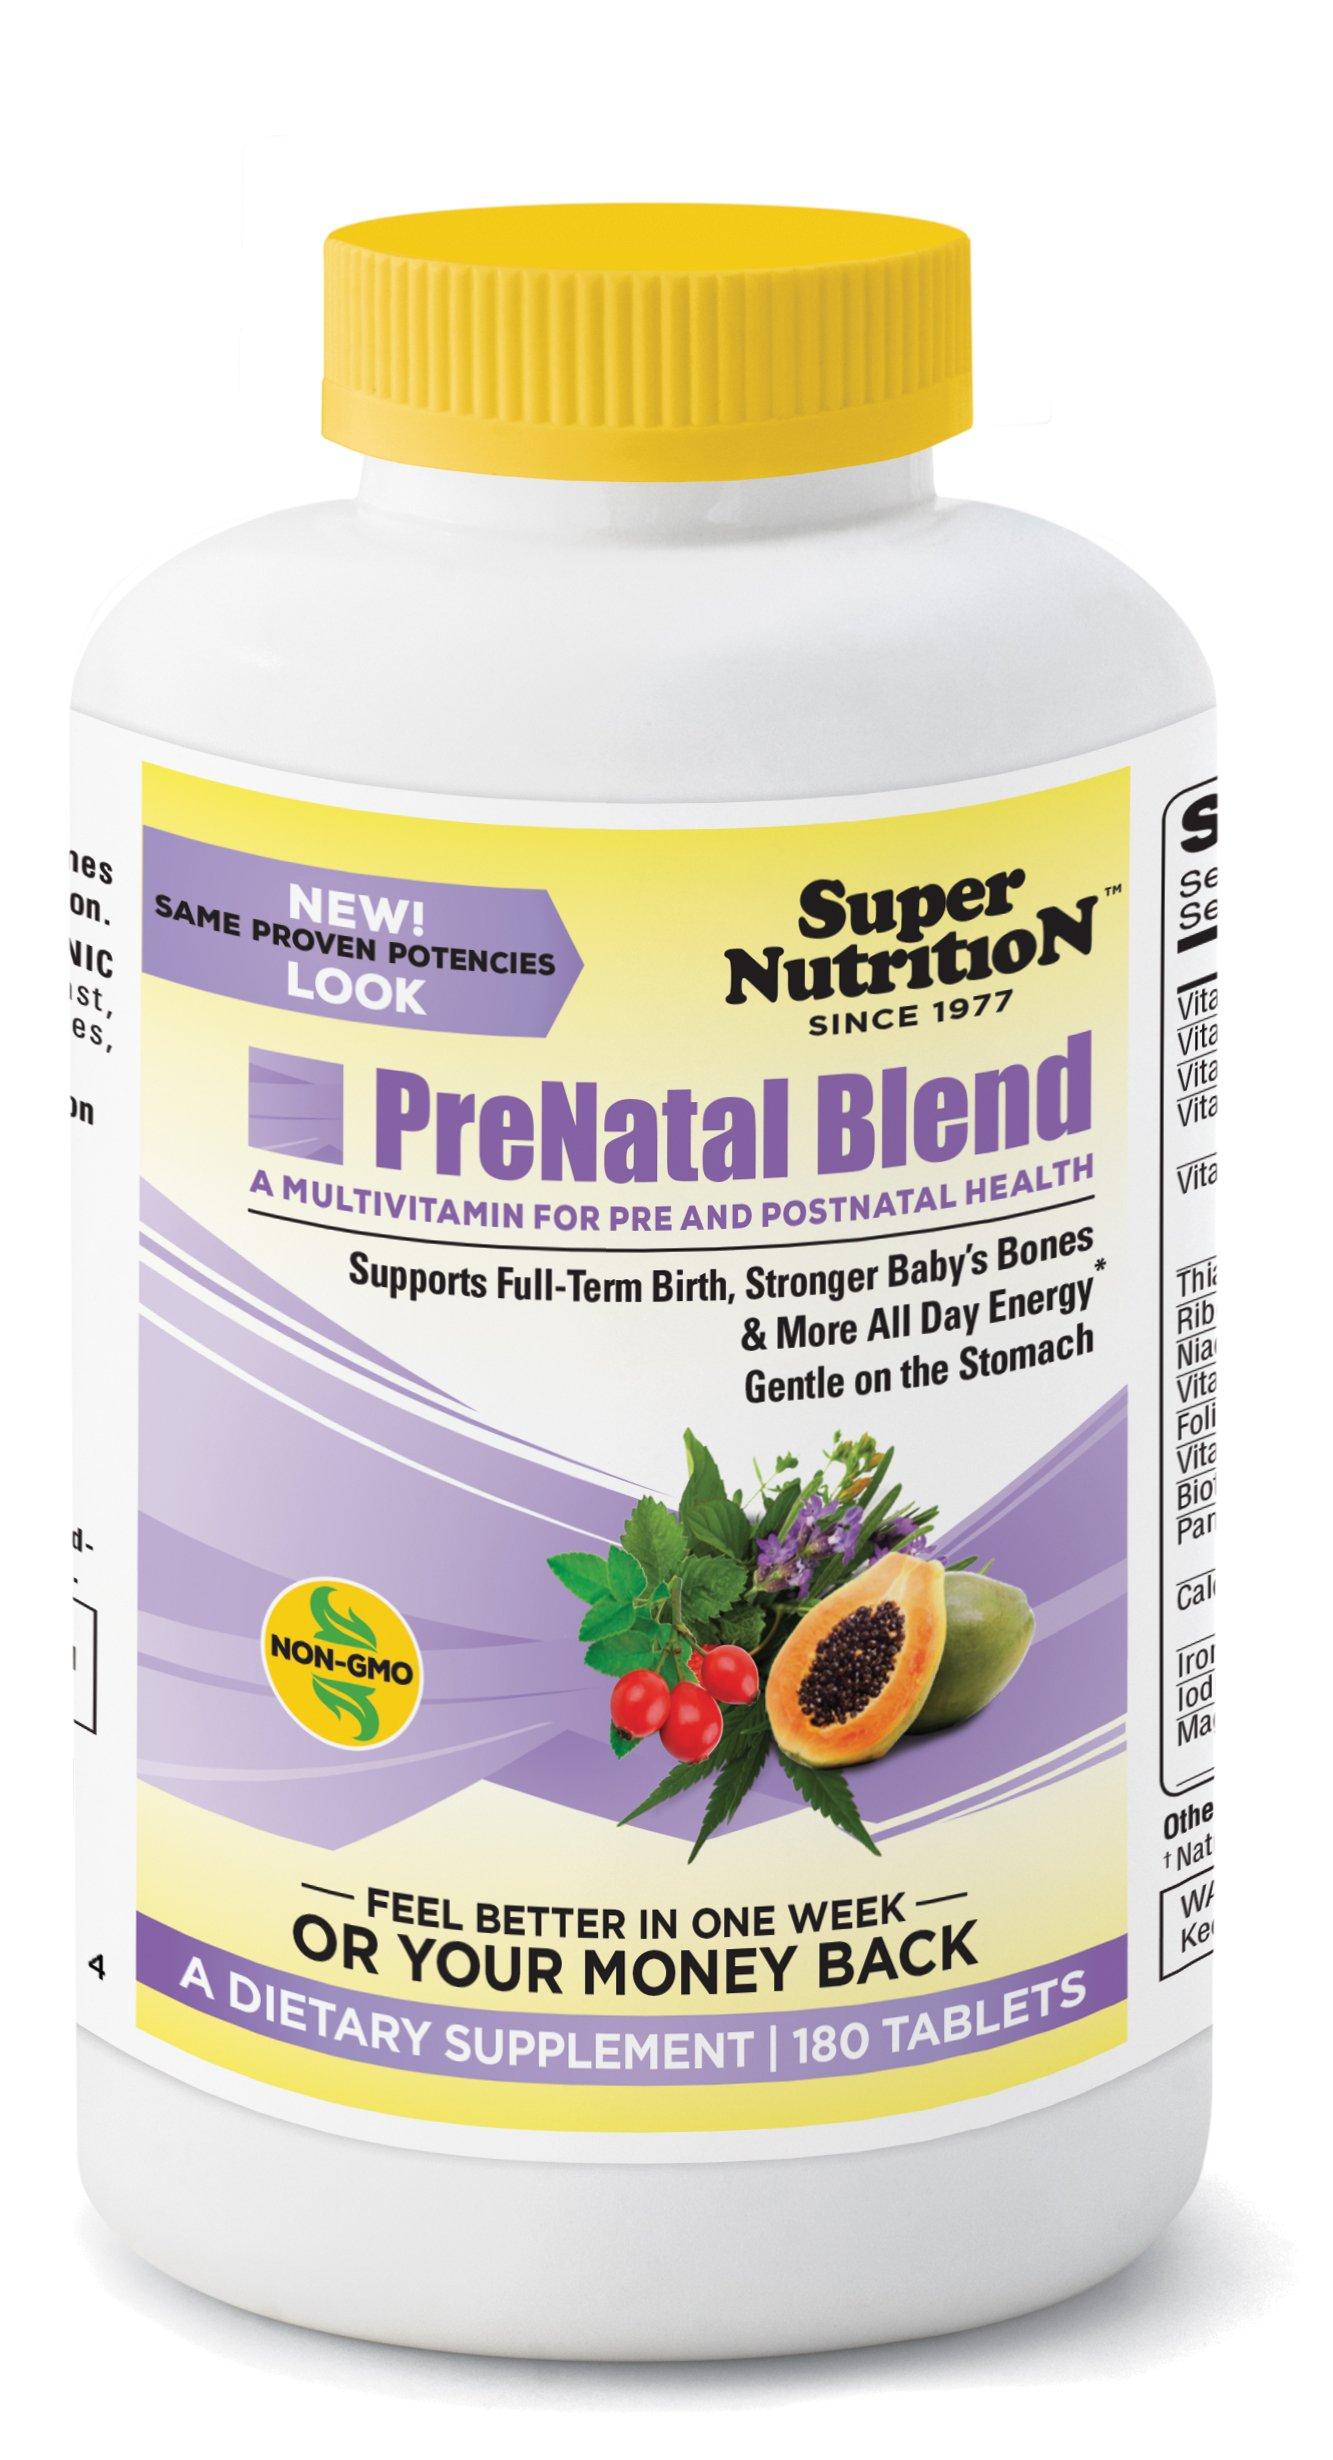 SuperNutrition Prenatal Multivitamin, gluten free, 180 Count - Best Value